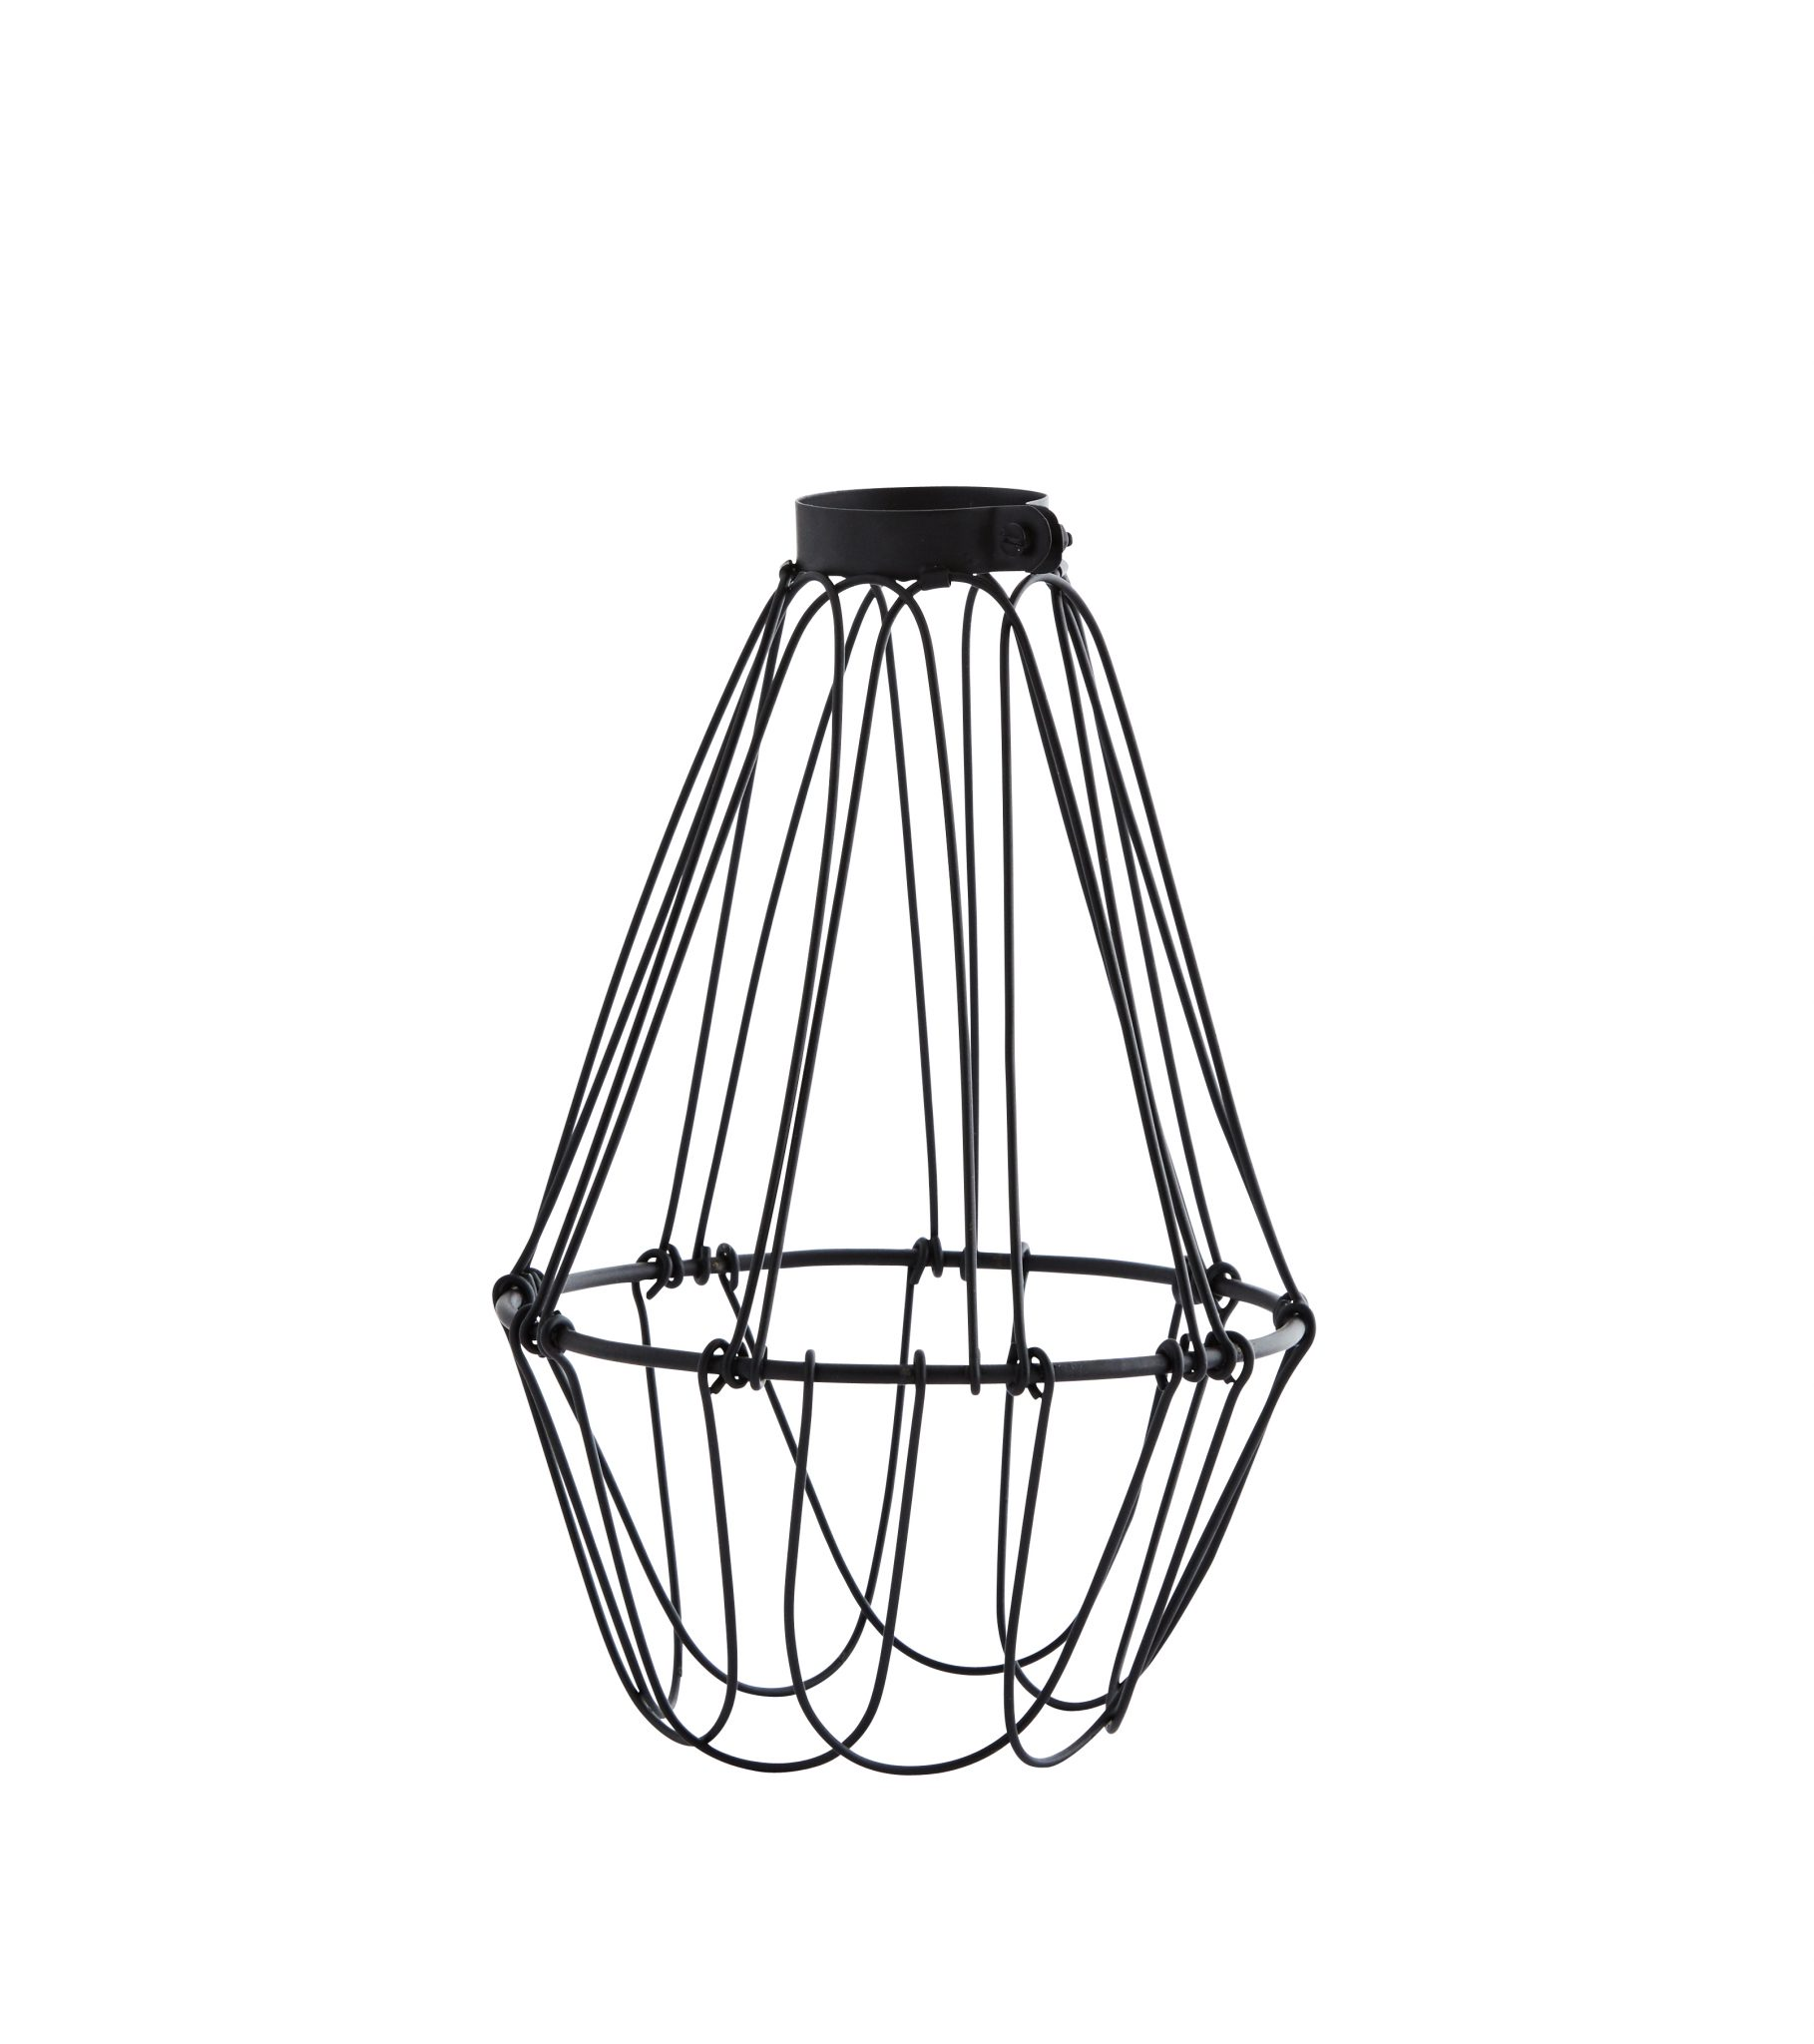 draht lampenschirm. Black Bedroom Furniture Sets. Home Design Ideas